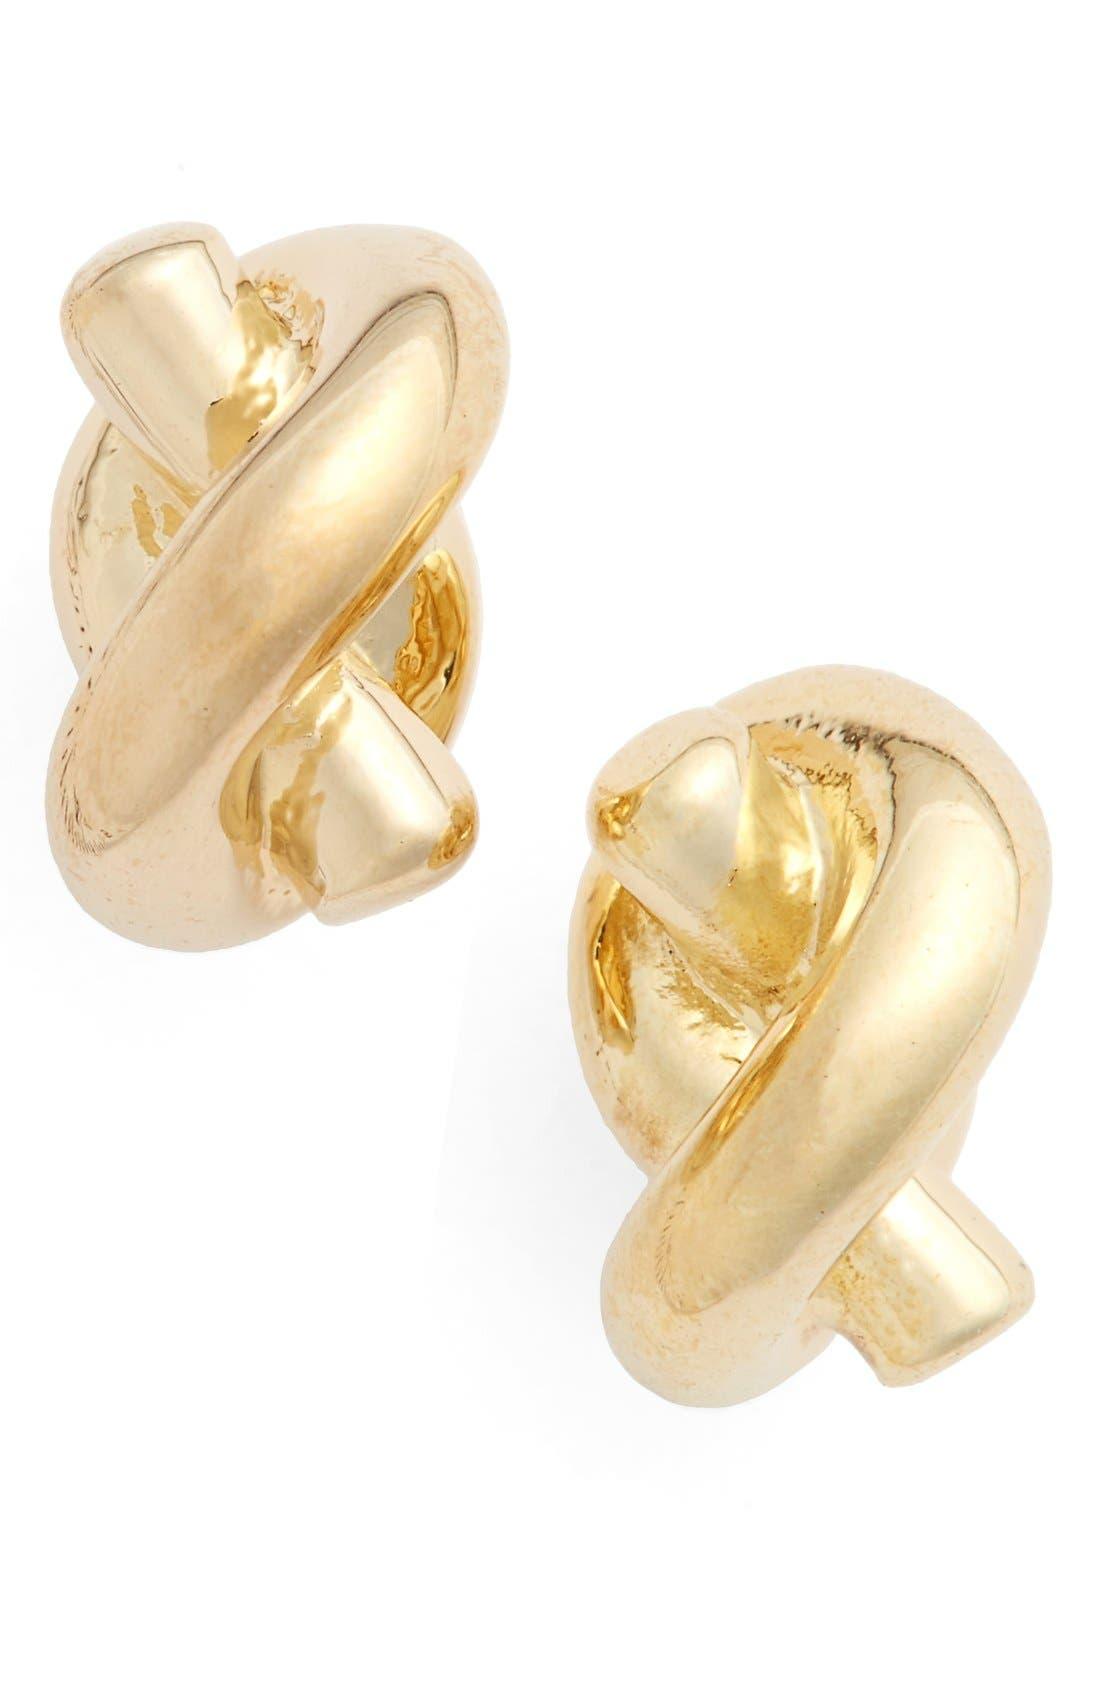 Earrings kate spade Jewelry   Nordstrom